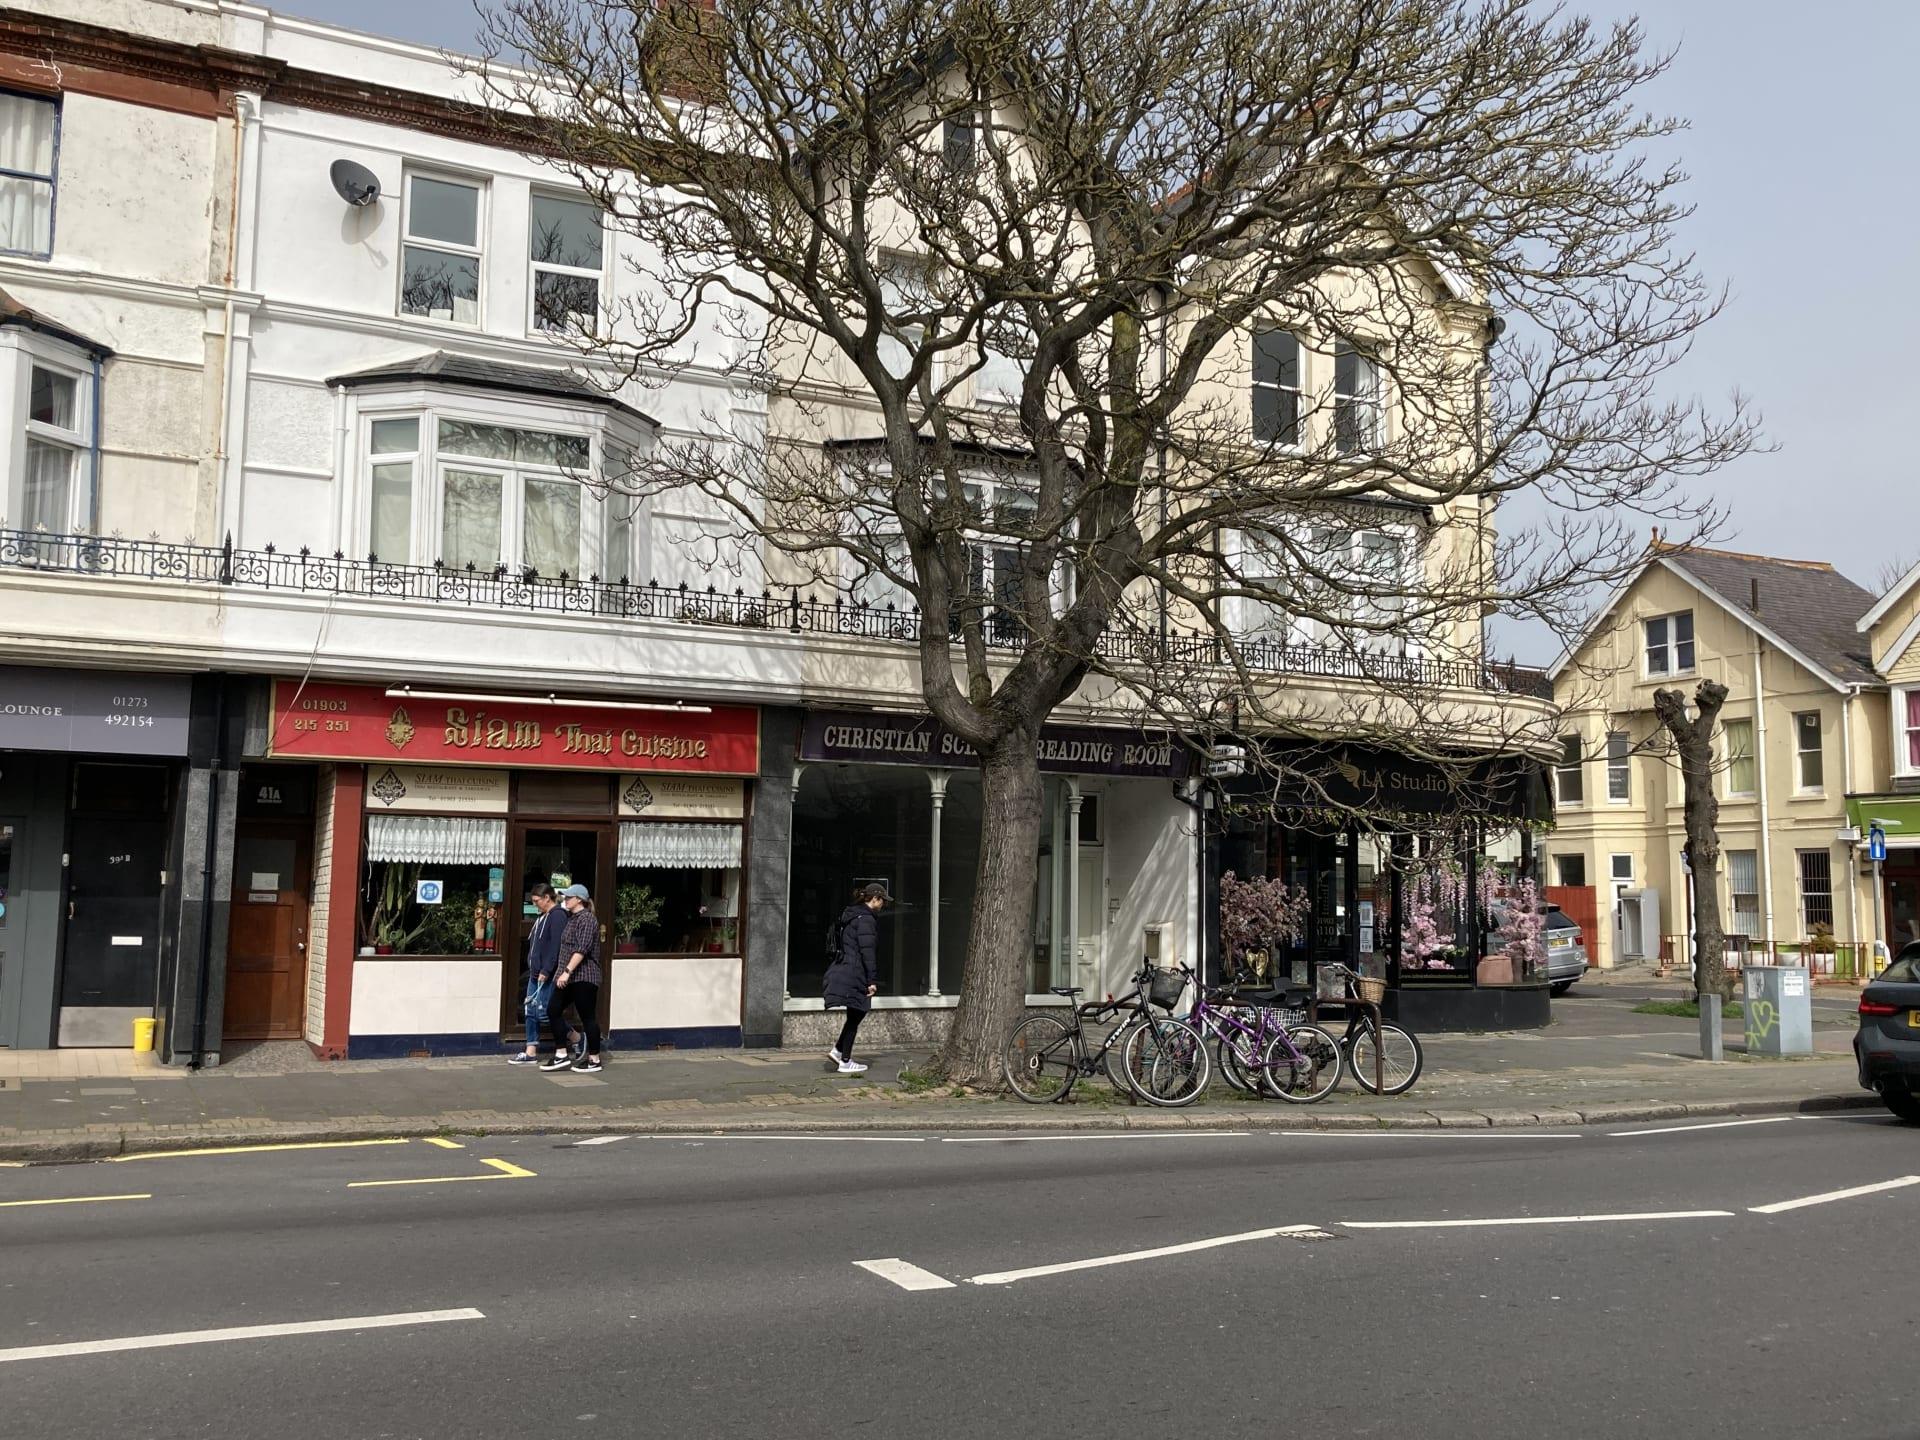 43 Brighton Road Worthing image.